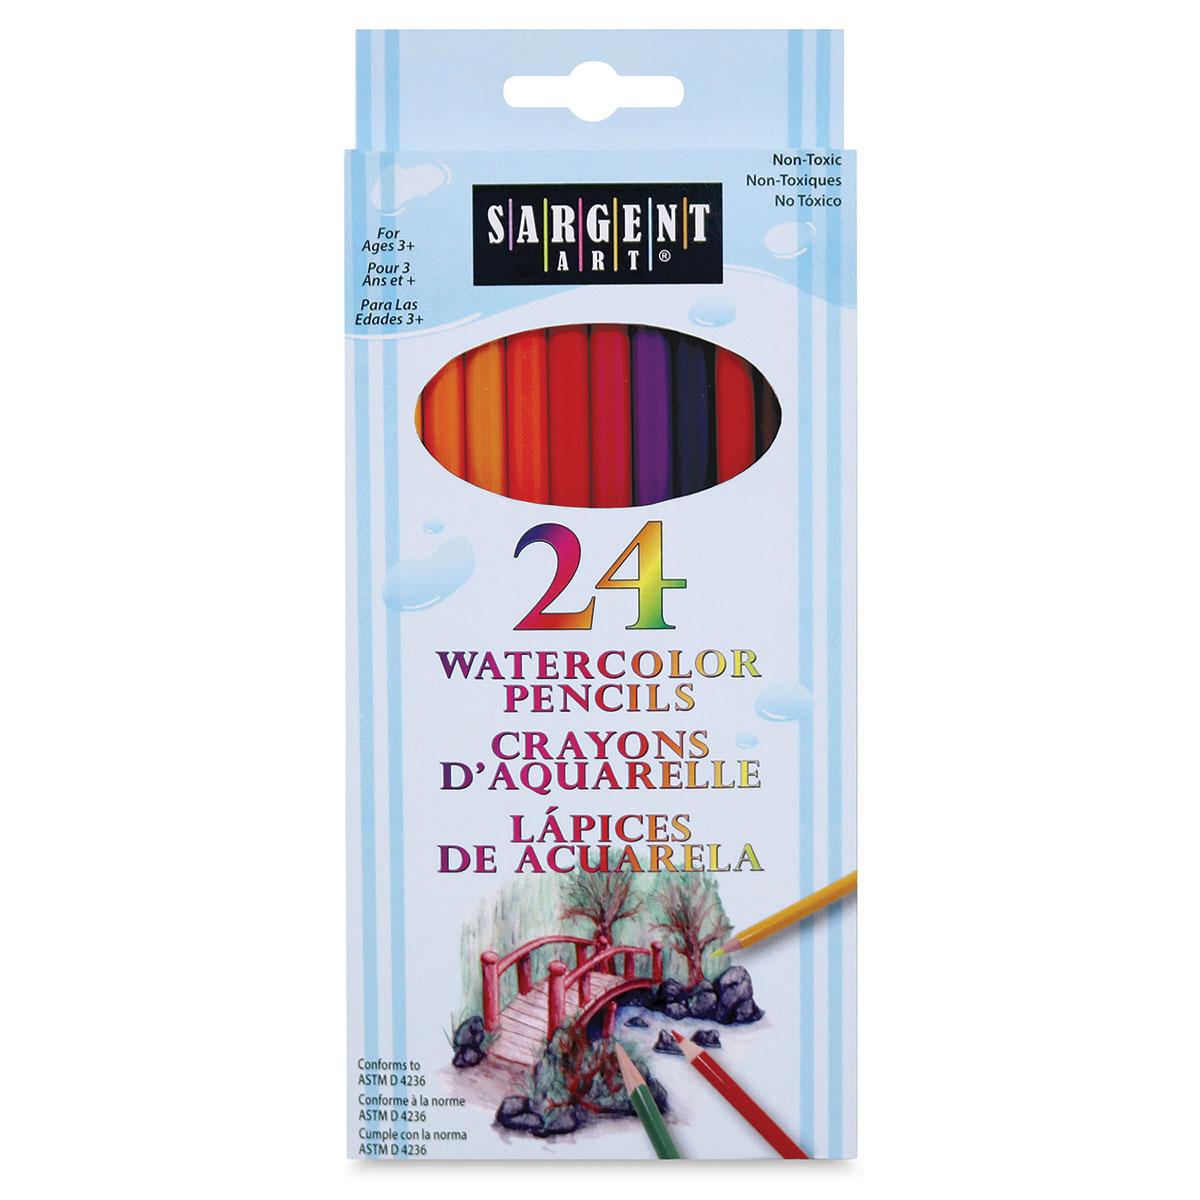 Sargent Art Non-Toxic Watercolor Pencil 7 in L Set of 12 Assorted Color